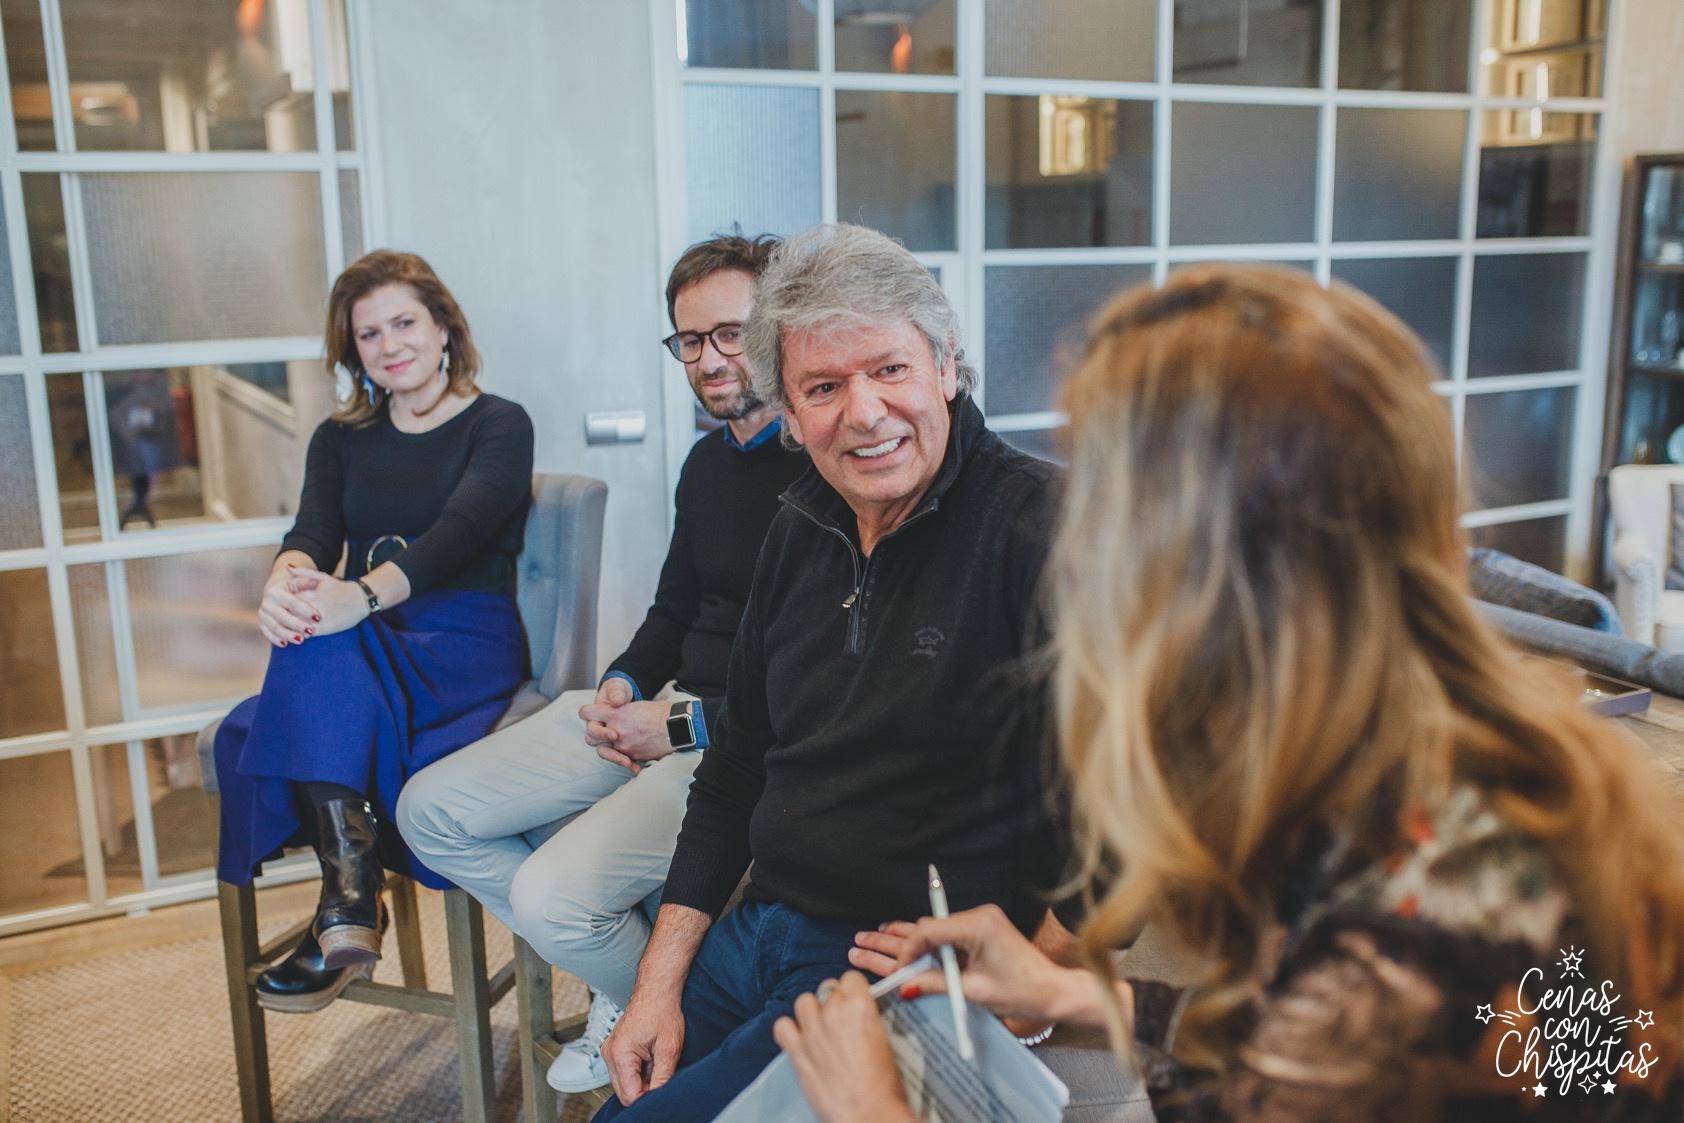 Cenas-con-Chispitas-Atelier-Dani-García-Gisela-Intimates NEHCAA